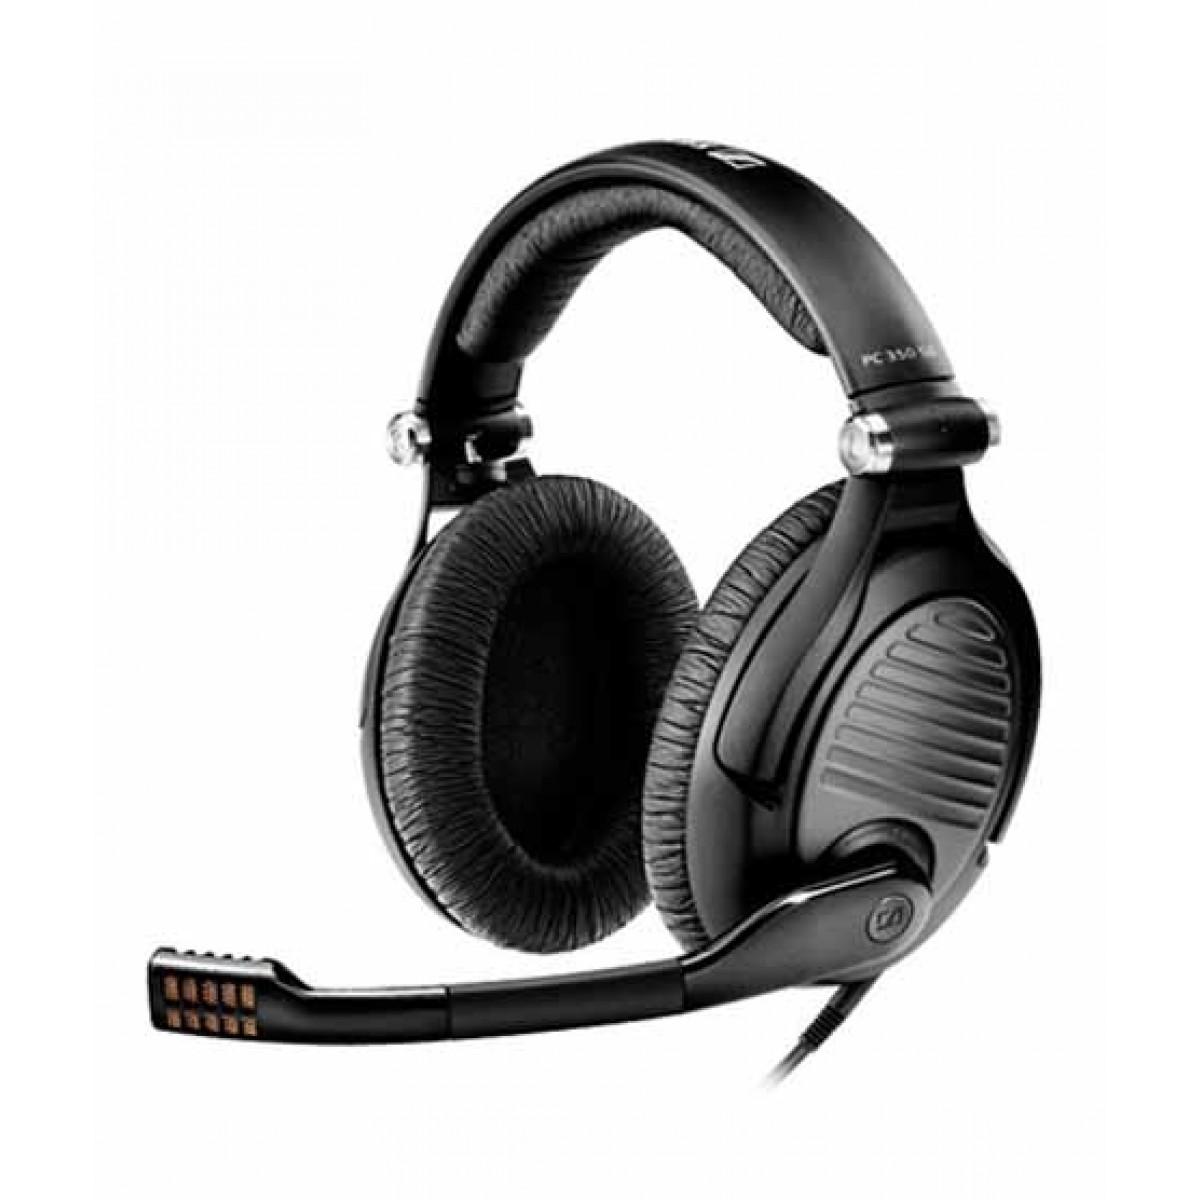 8cfbcce428f Sennheiser PC 350 Special Edition Headphones Price in Pakistan   Buy  Sennheiser Over-Ear Gaming Headphones   iShopping.pk